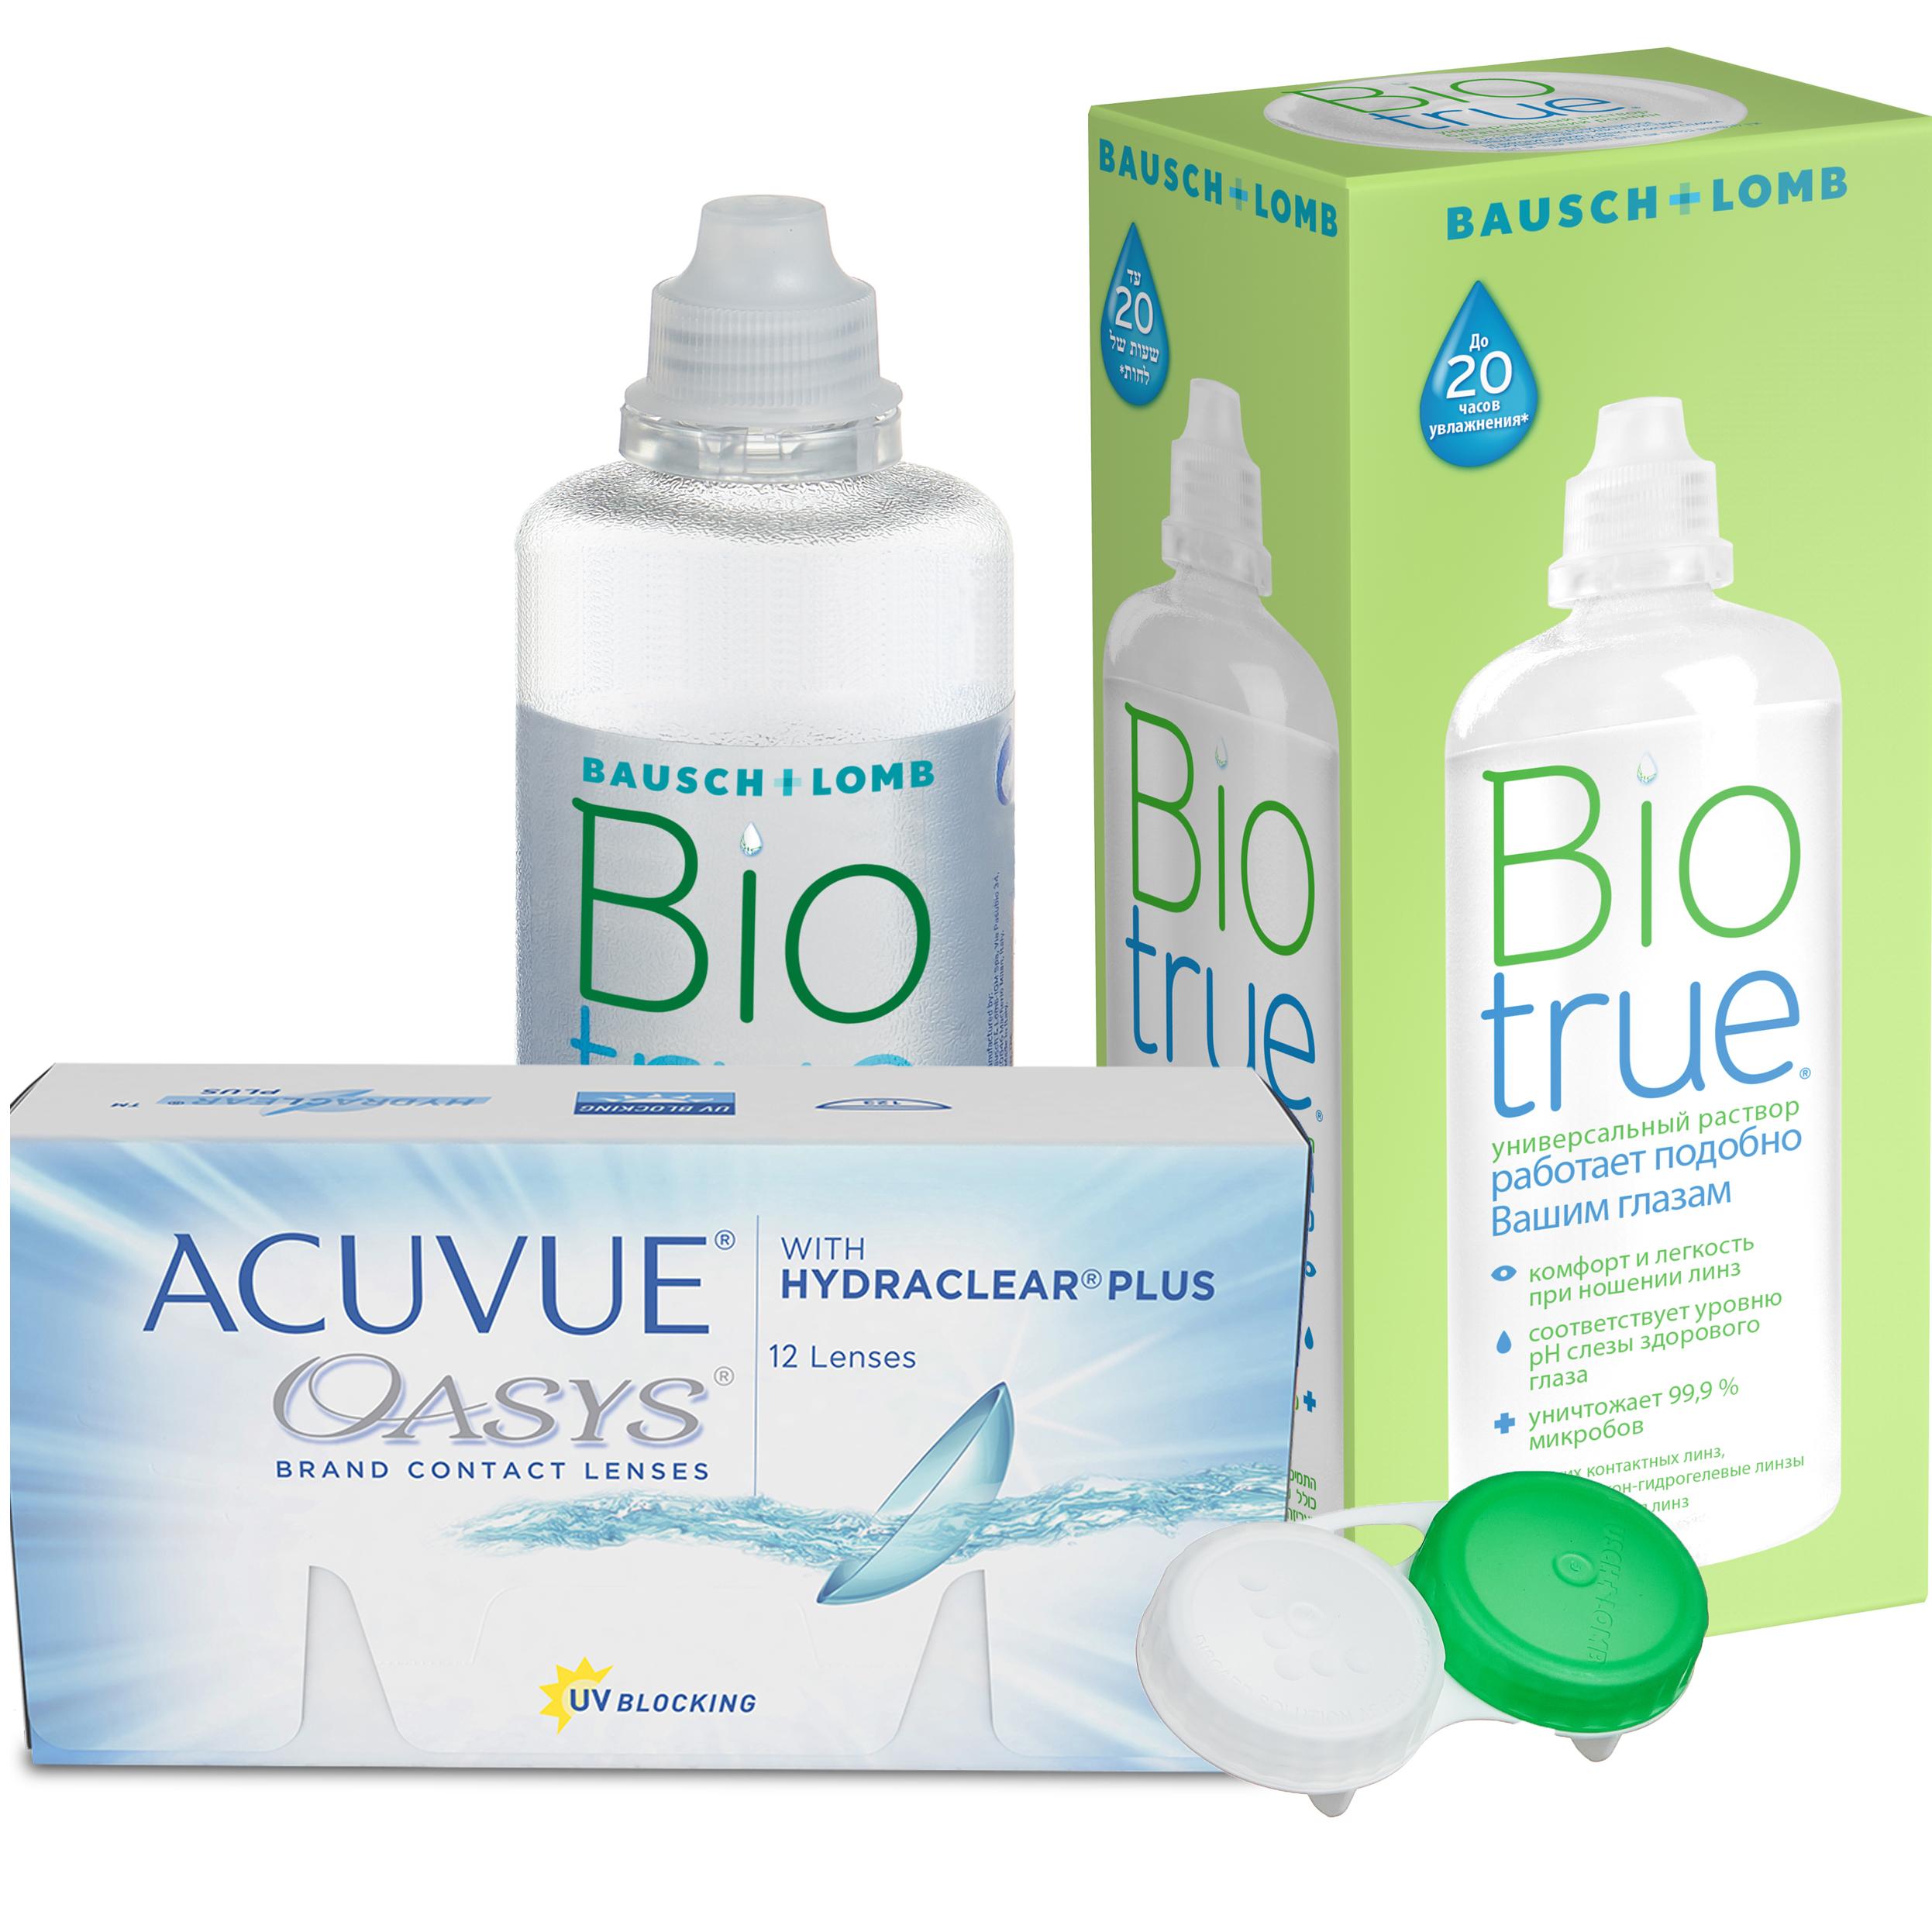 Купить Oasys with Hydraclear Plus 12 линз + Biotrue, Контактные линзы Acuvue Oasys with Hydraclear Plus 12 линз R 8.4 +3, 50 + Biotrue 300 мл